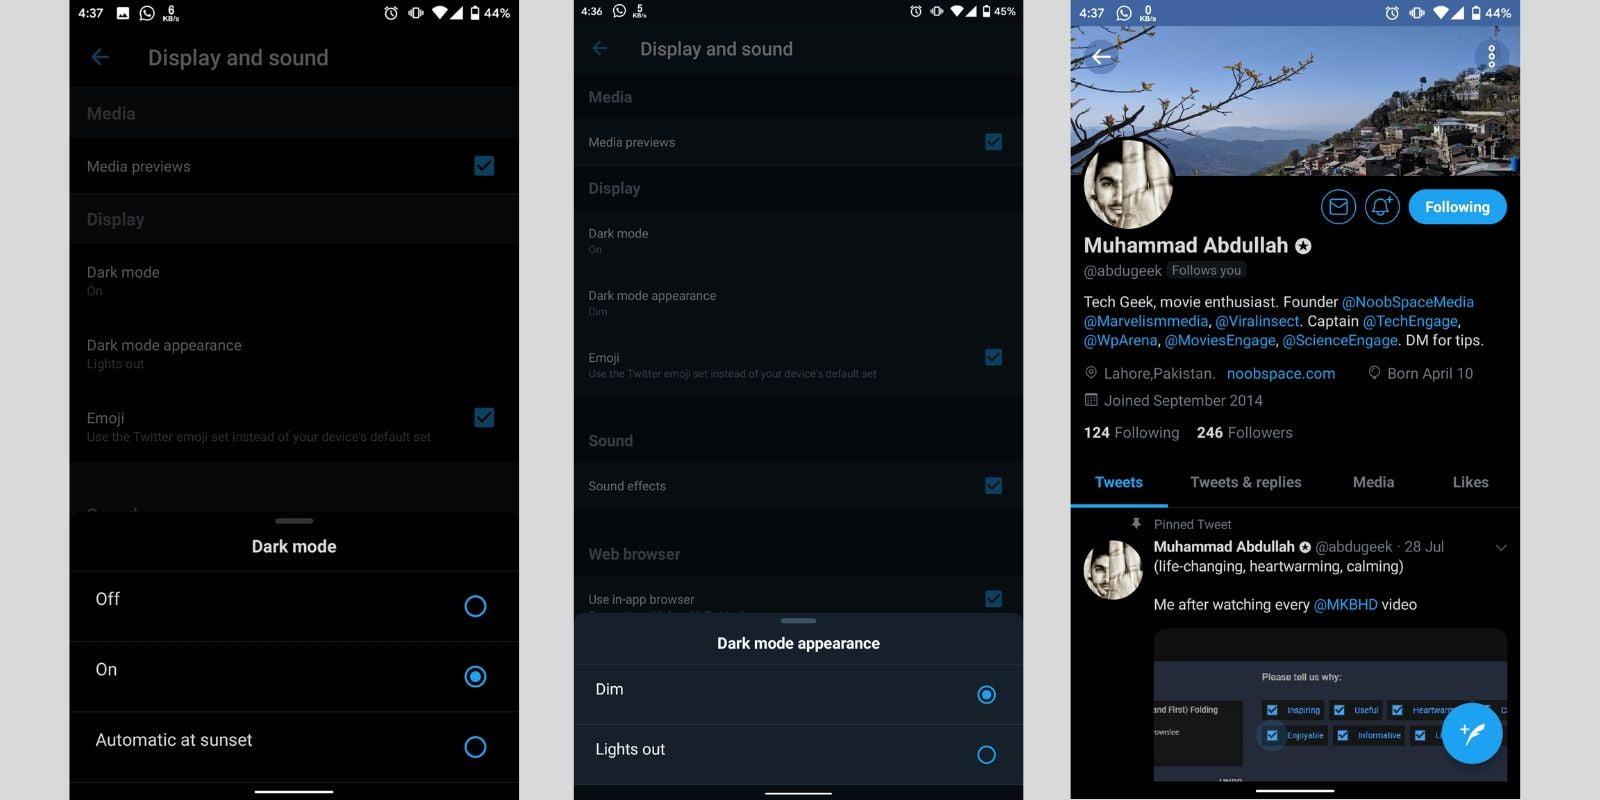 Twitter lights out vs dim mode